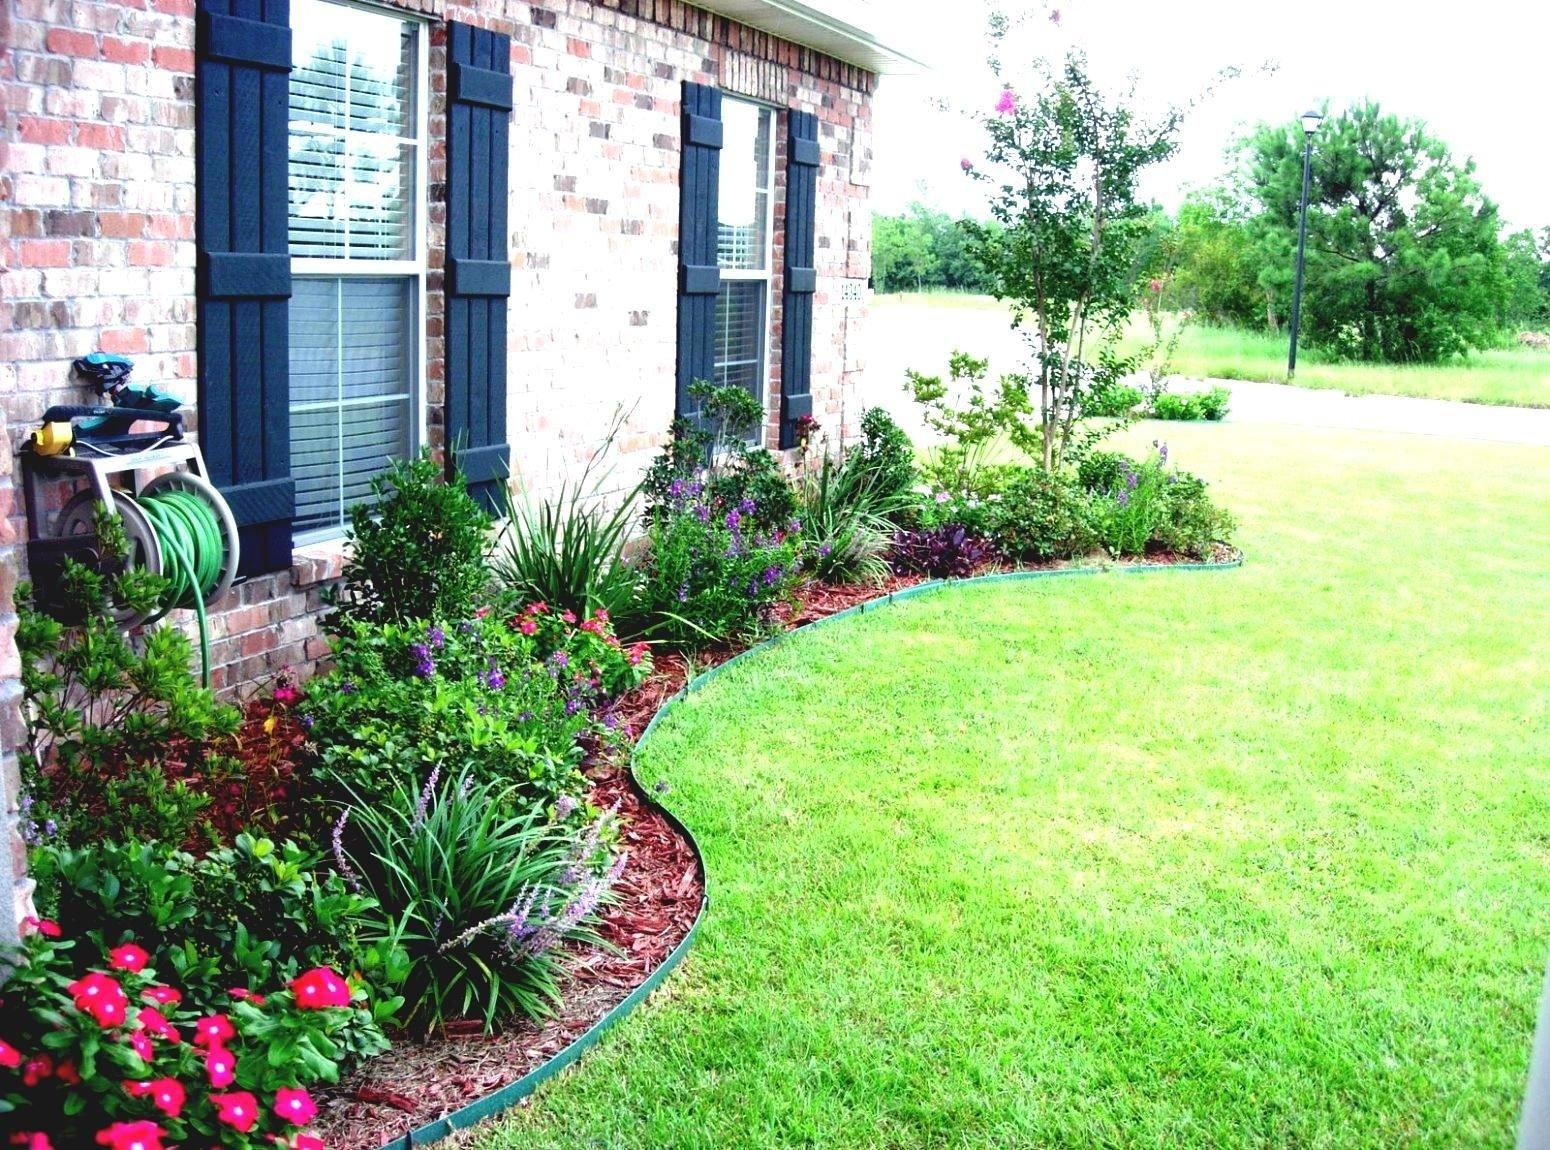 10 Trendy Simple Front Yard Landscaping Ideas simple landscaping ideas with low maintenance tropical daze 2020